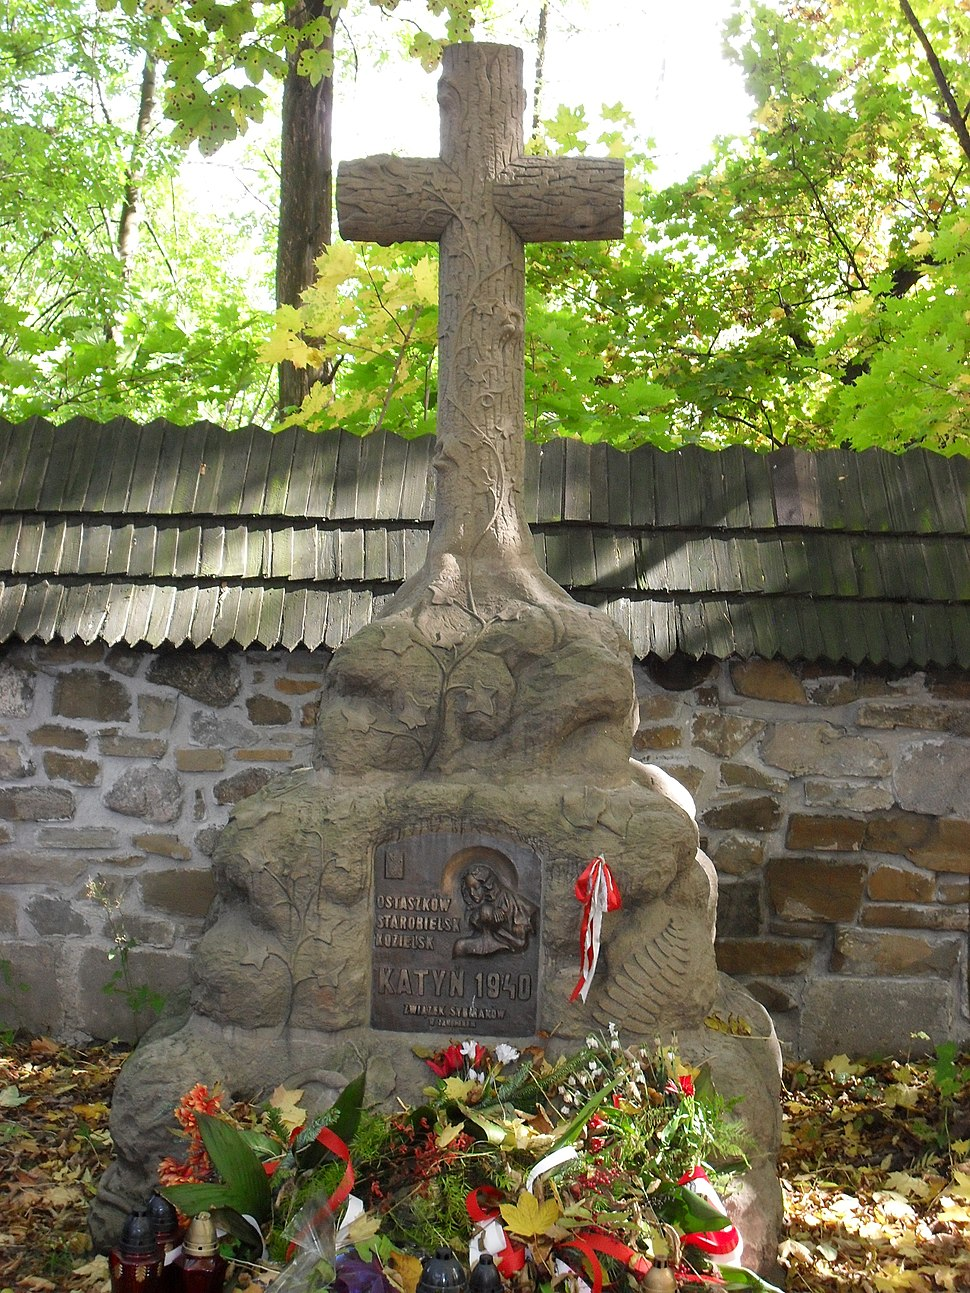 Katyn Memorial at Zakopane